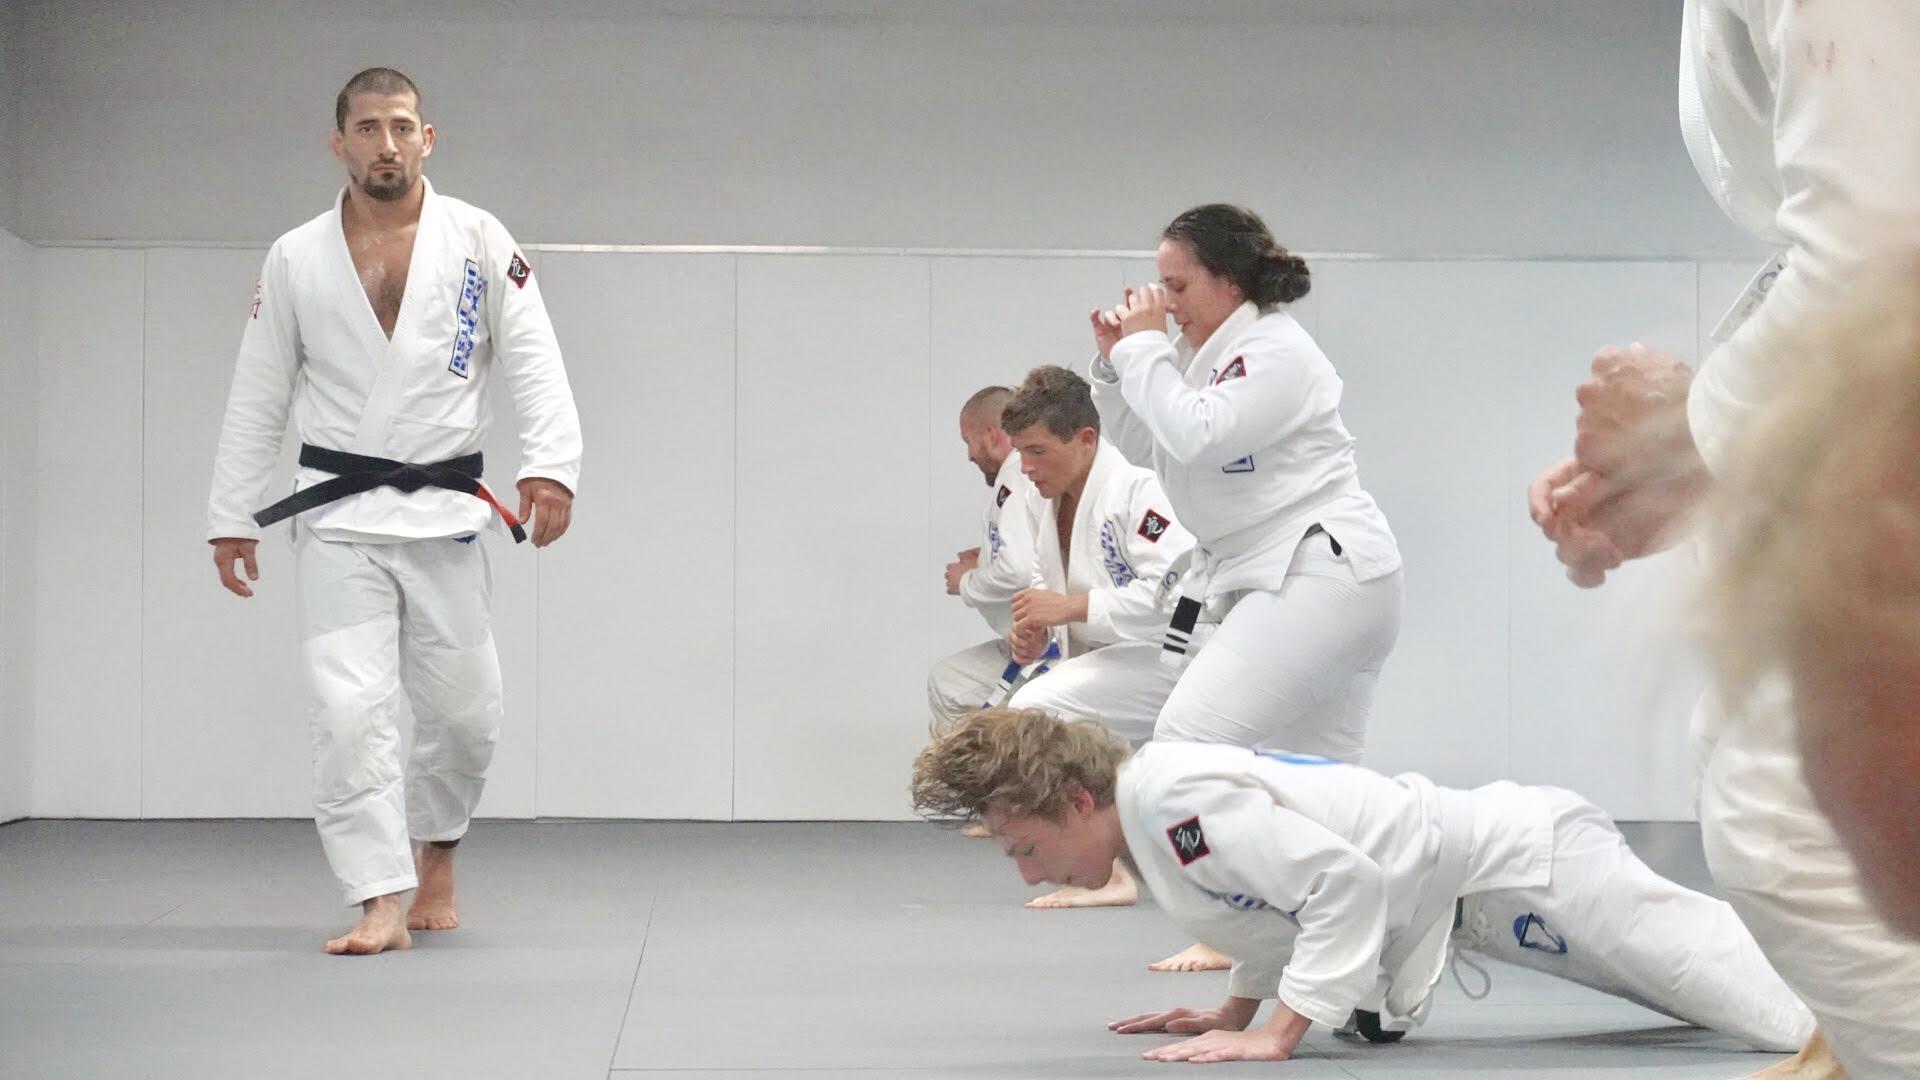 OZFit Brazilian Jiu Jitsu Classes in Bergen County - Gym in Waldwick NJ (5).jpg